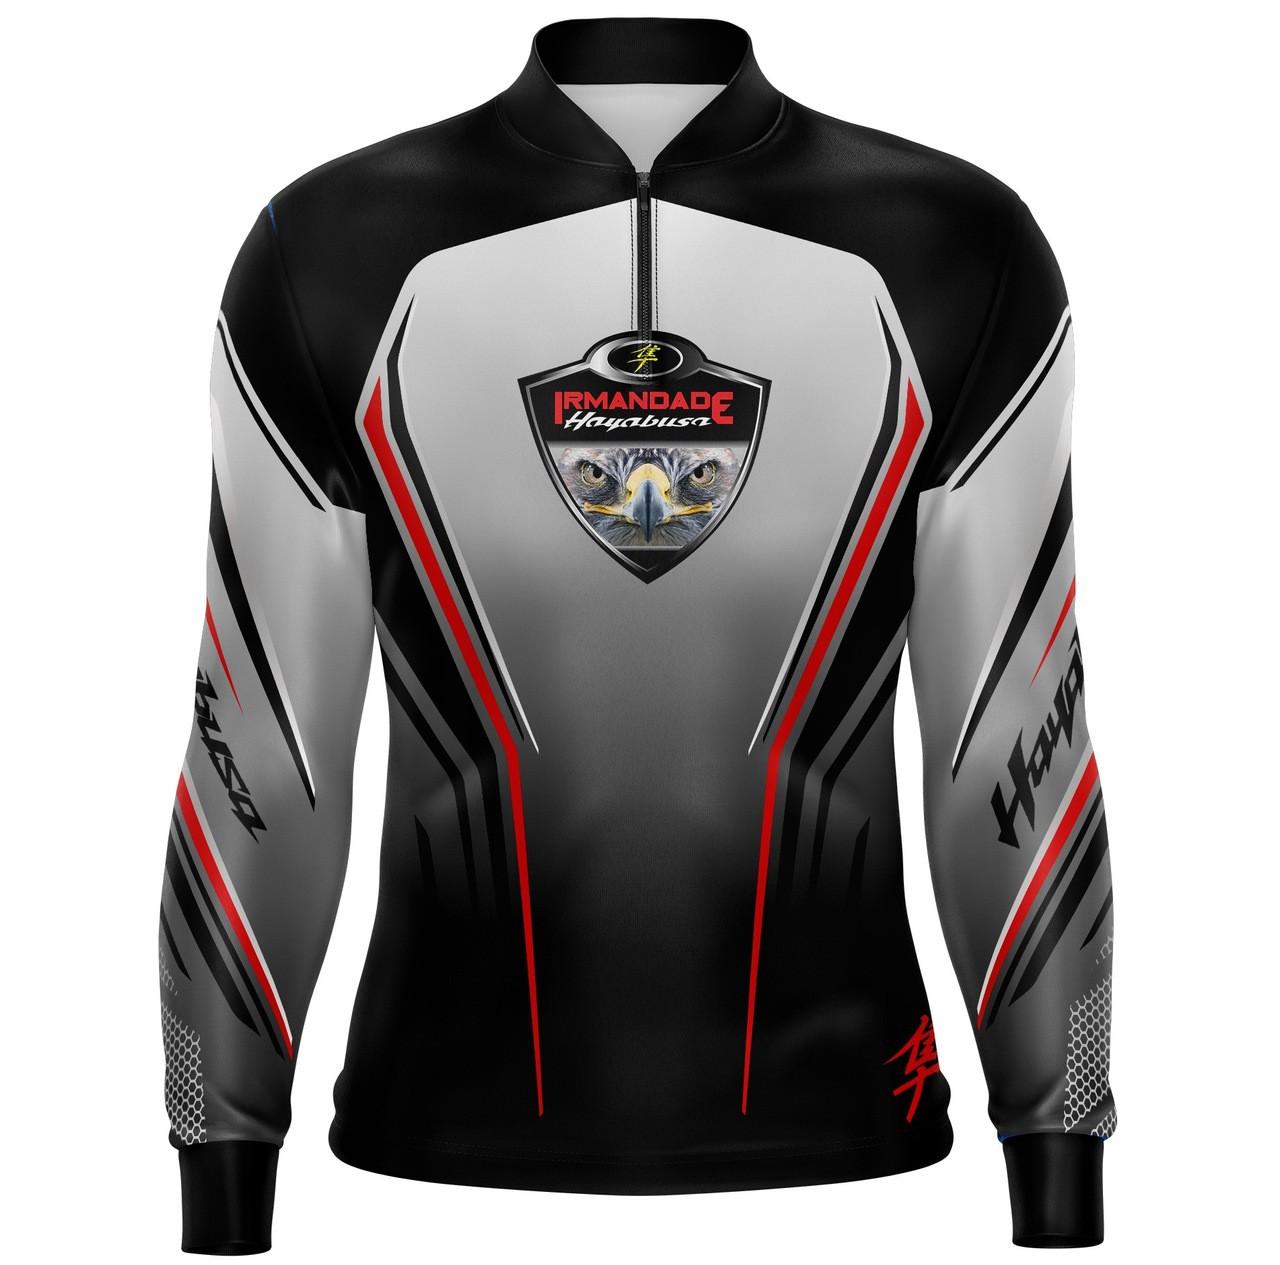 Camiseta Brk Motociclismo Irmandade Hayabusa 2019